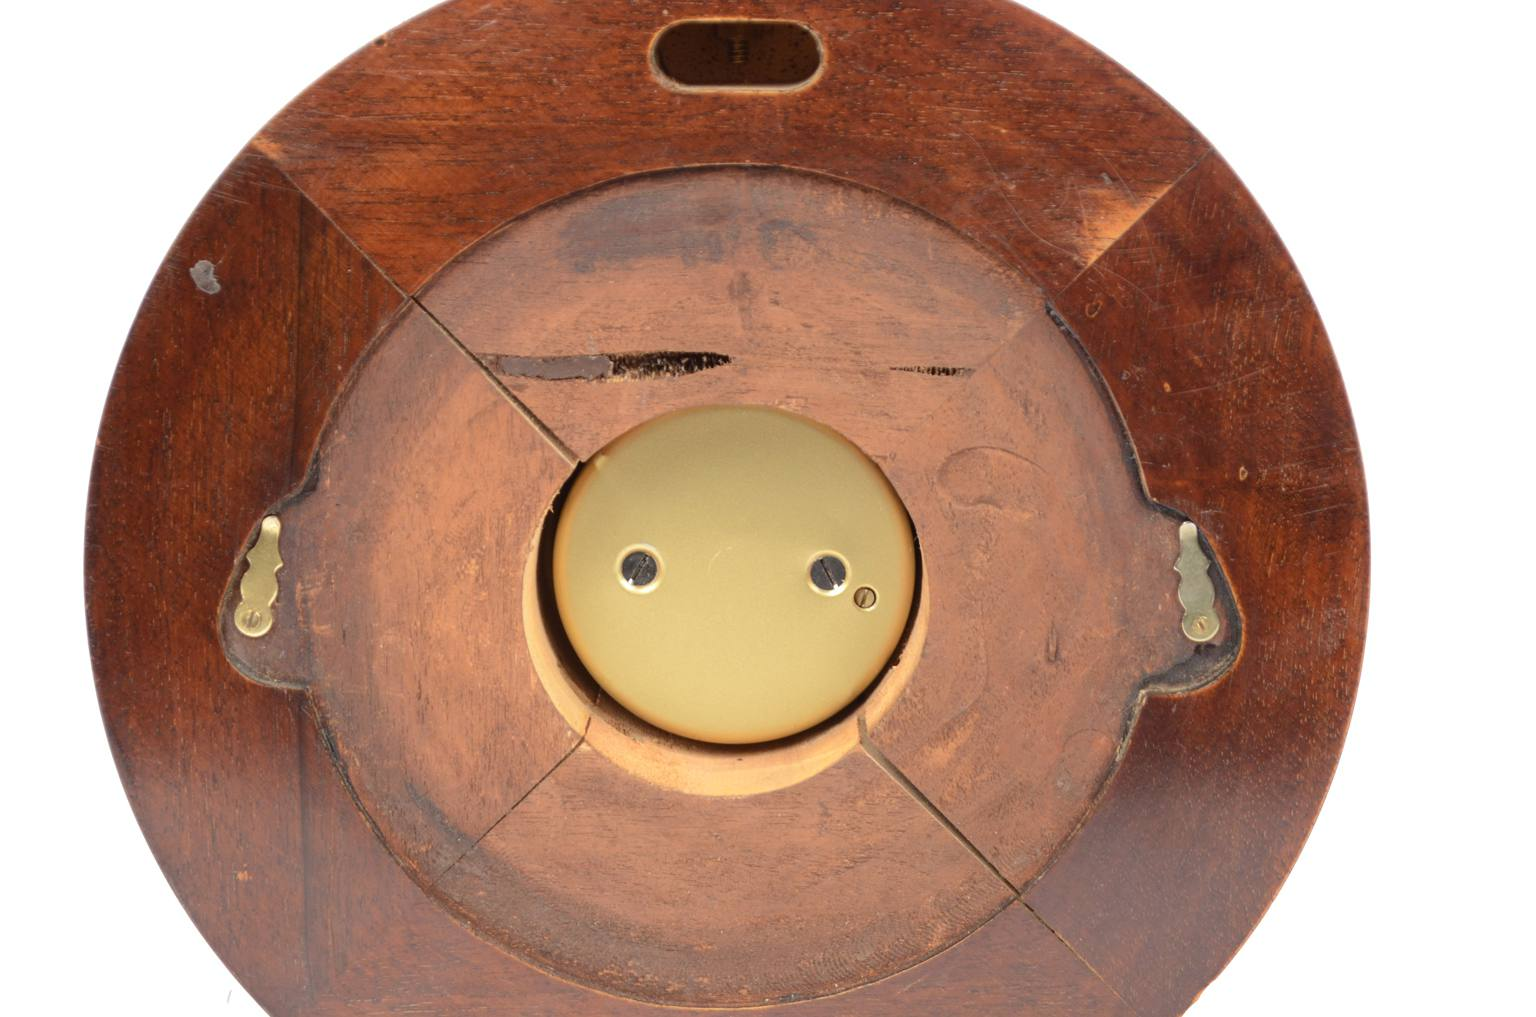 Barometri antichi/6183-Grande barometro